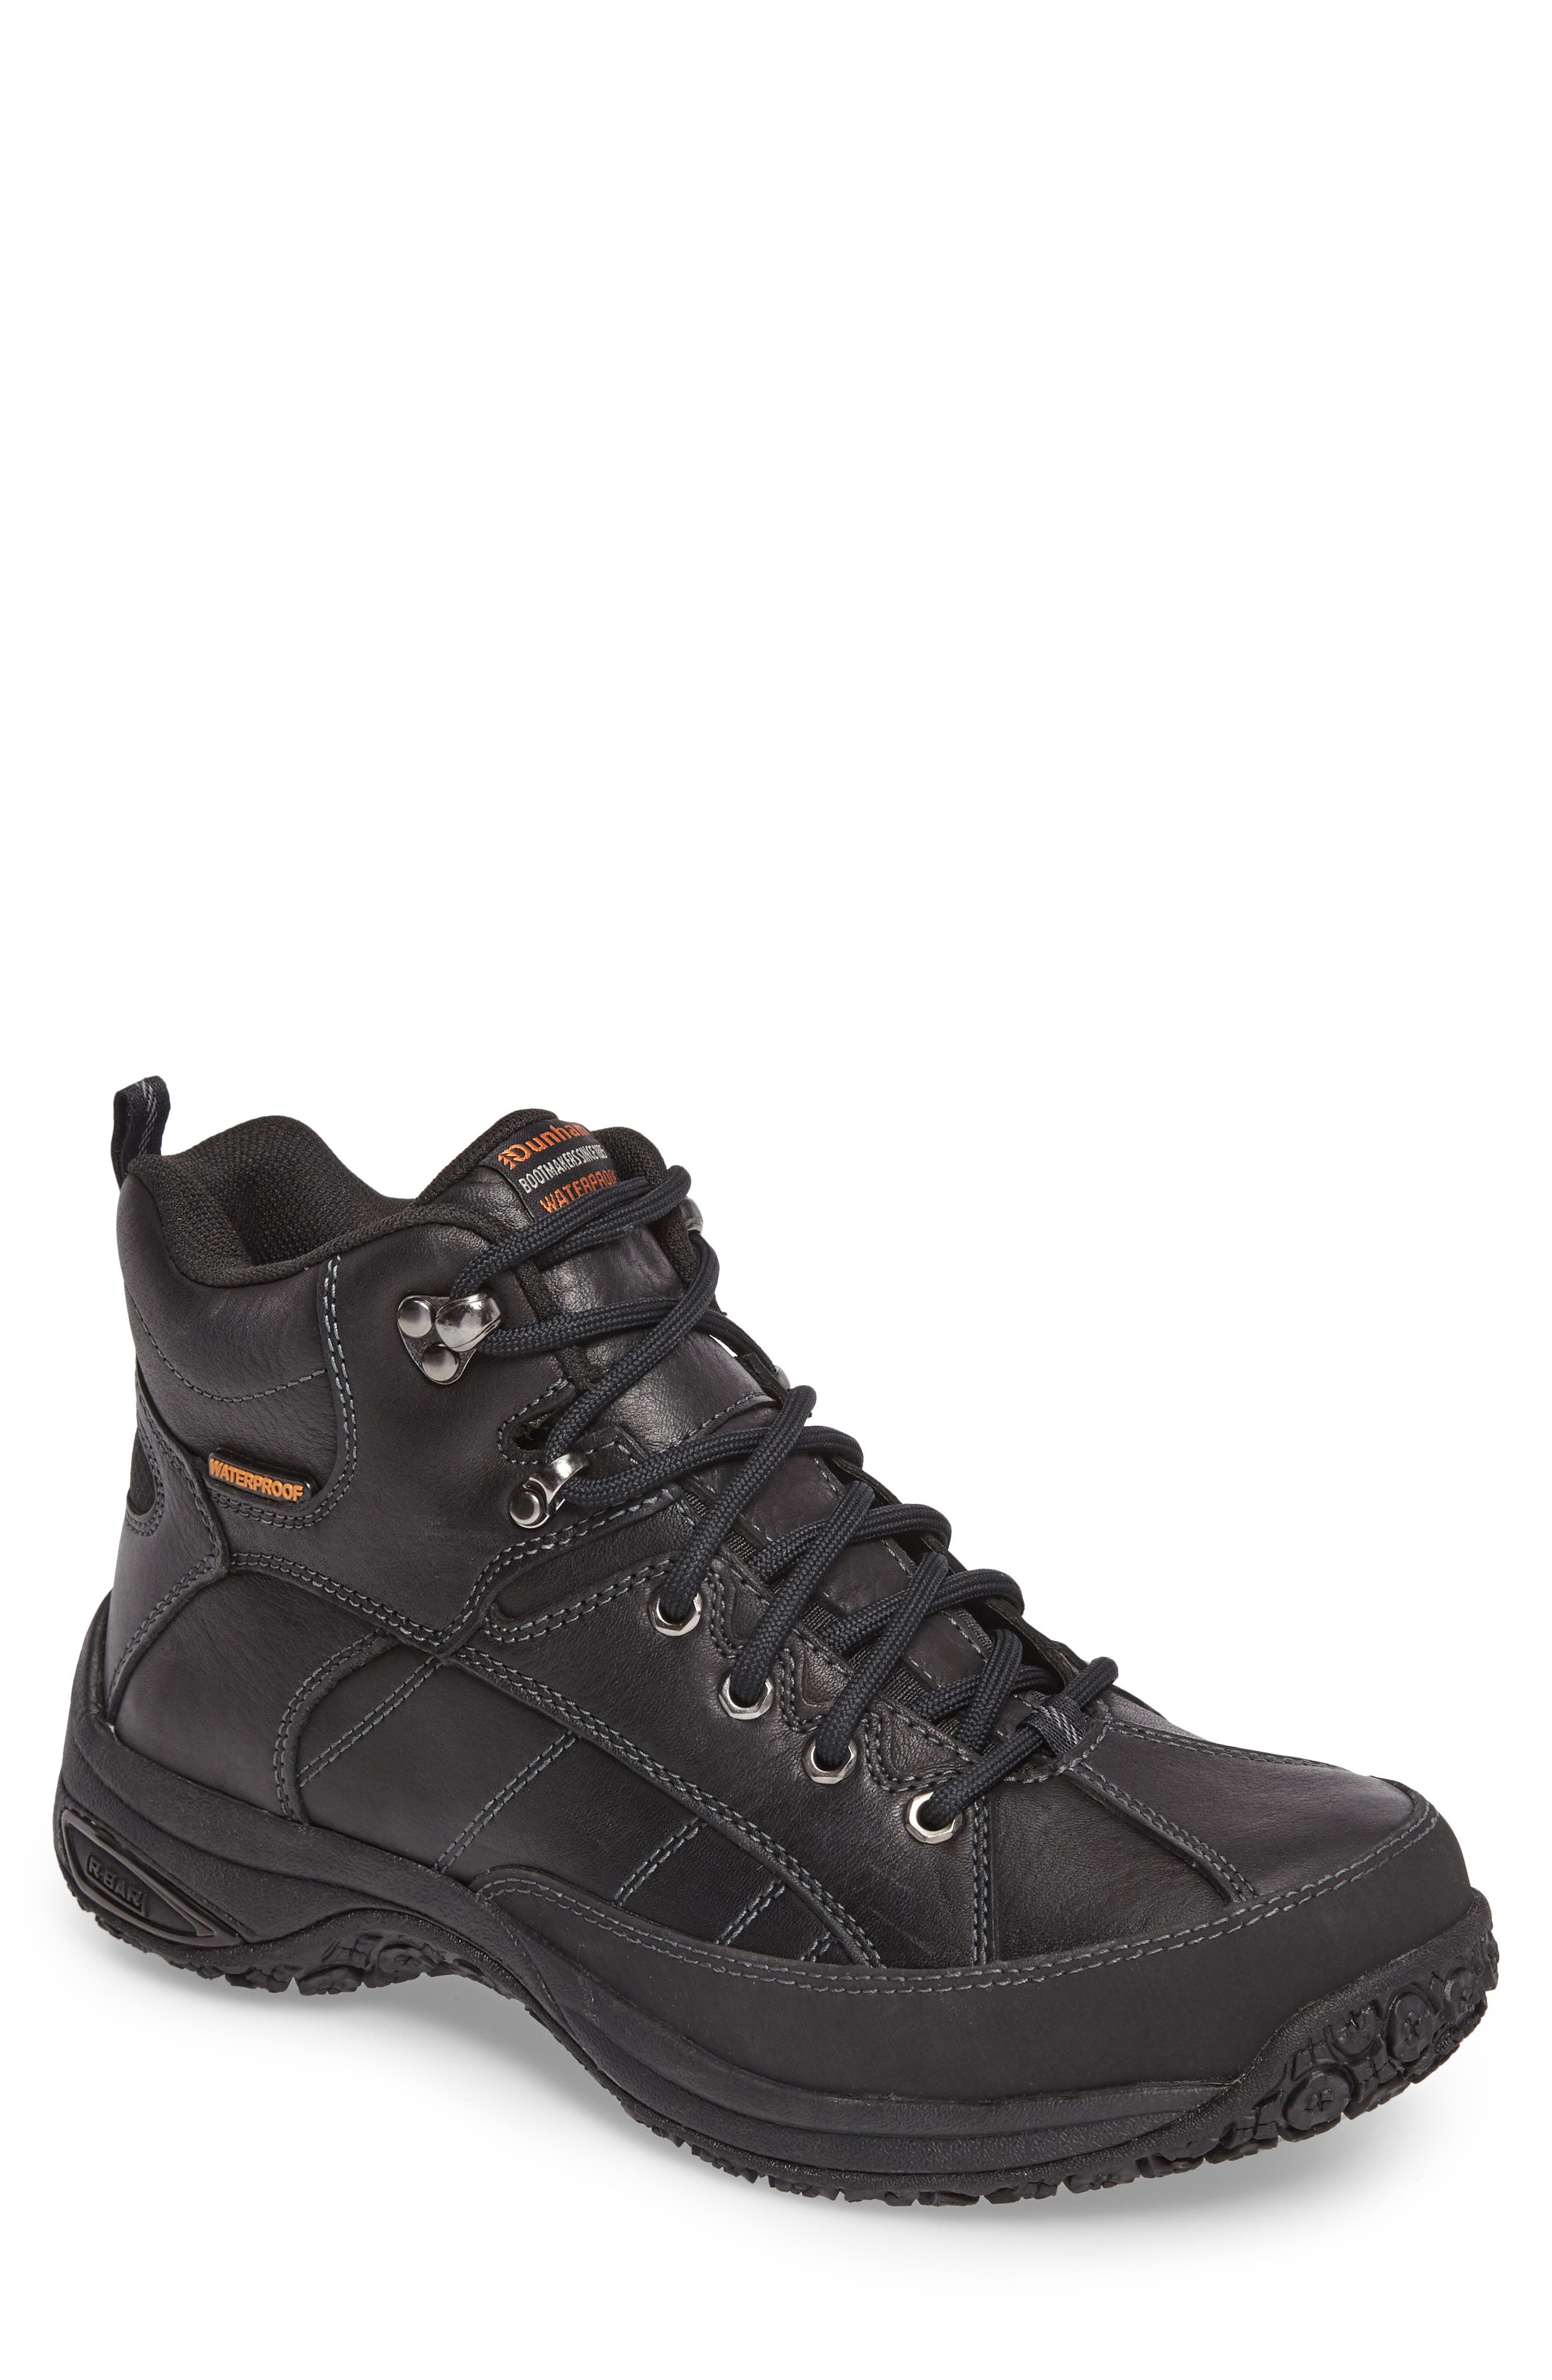 Lawrence Waterproof Boot